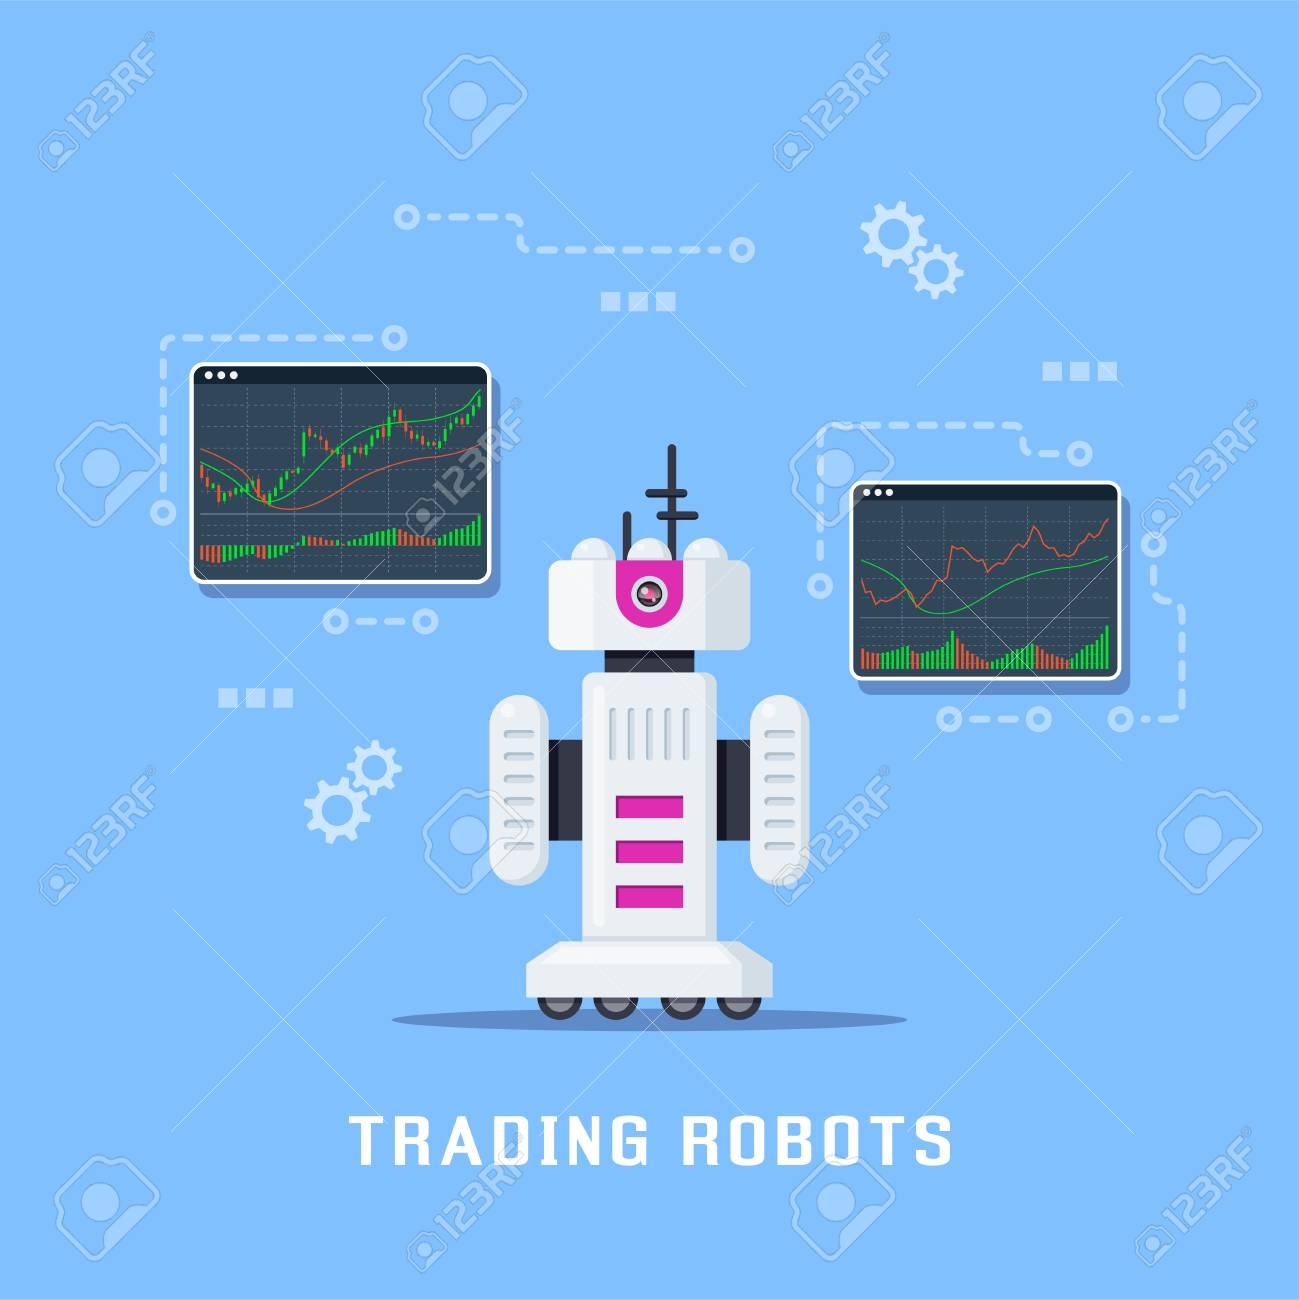 trading robots concept banner